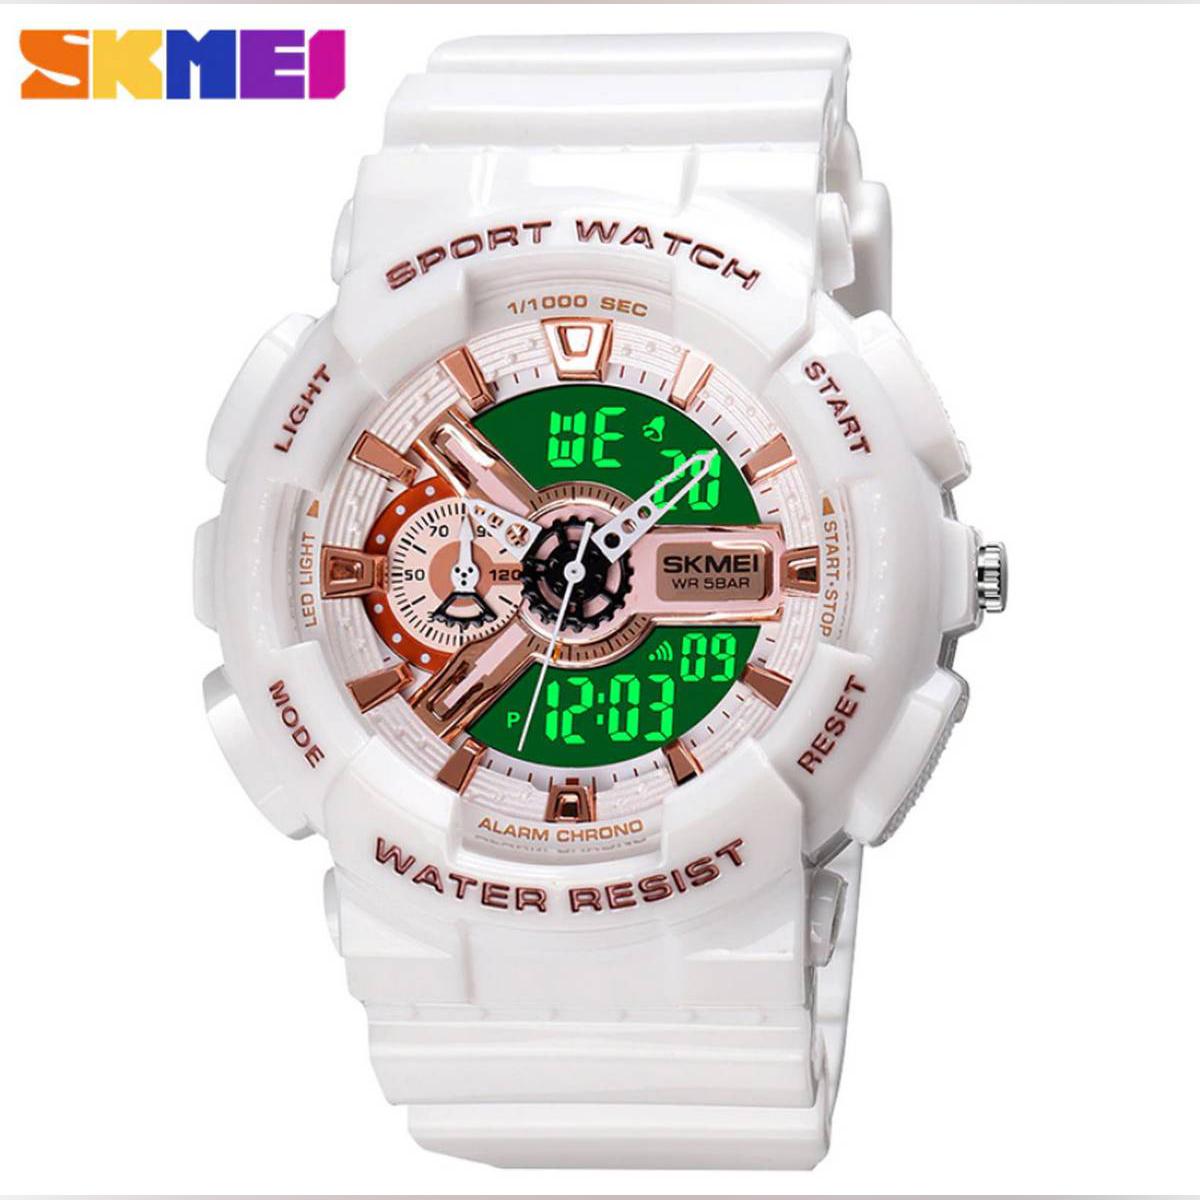 SKMEI 1688 Dual Display Waterproof Watch for Men Women - Black Gold